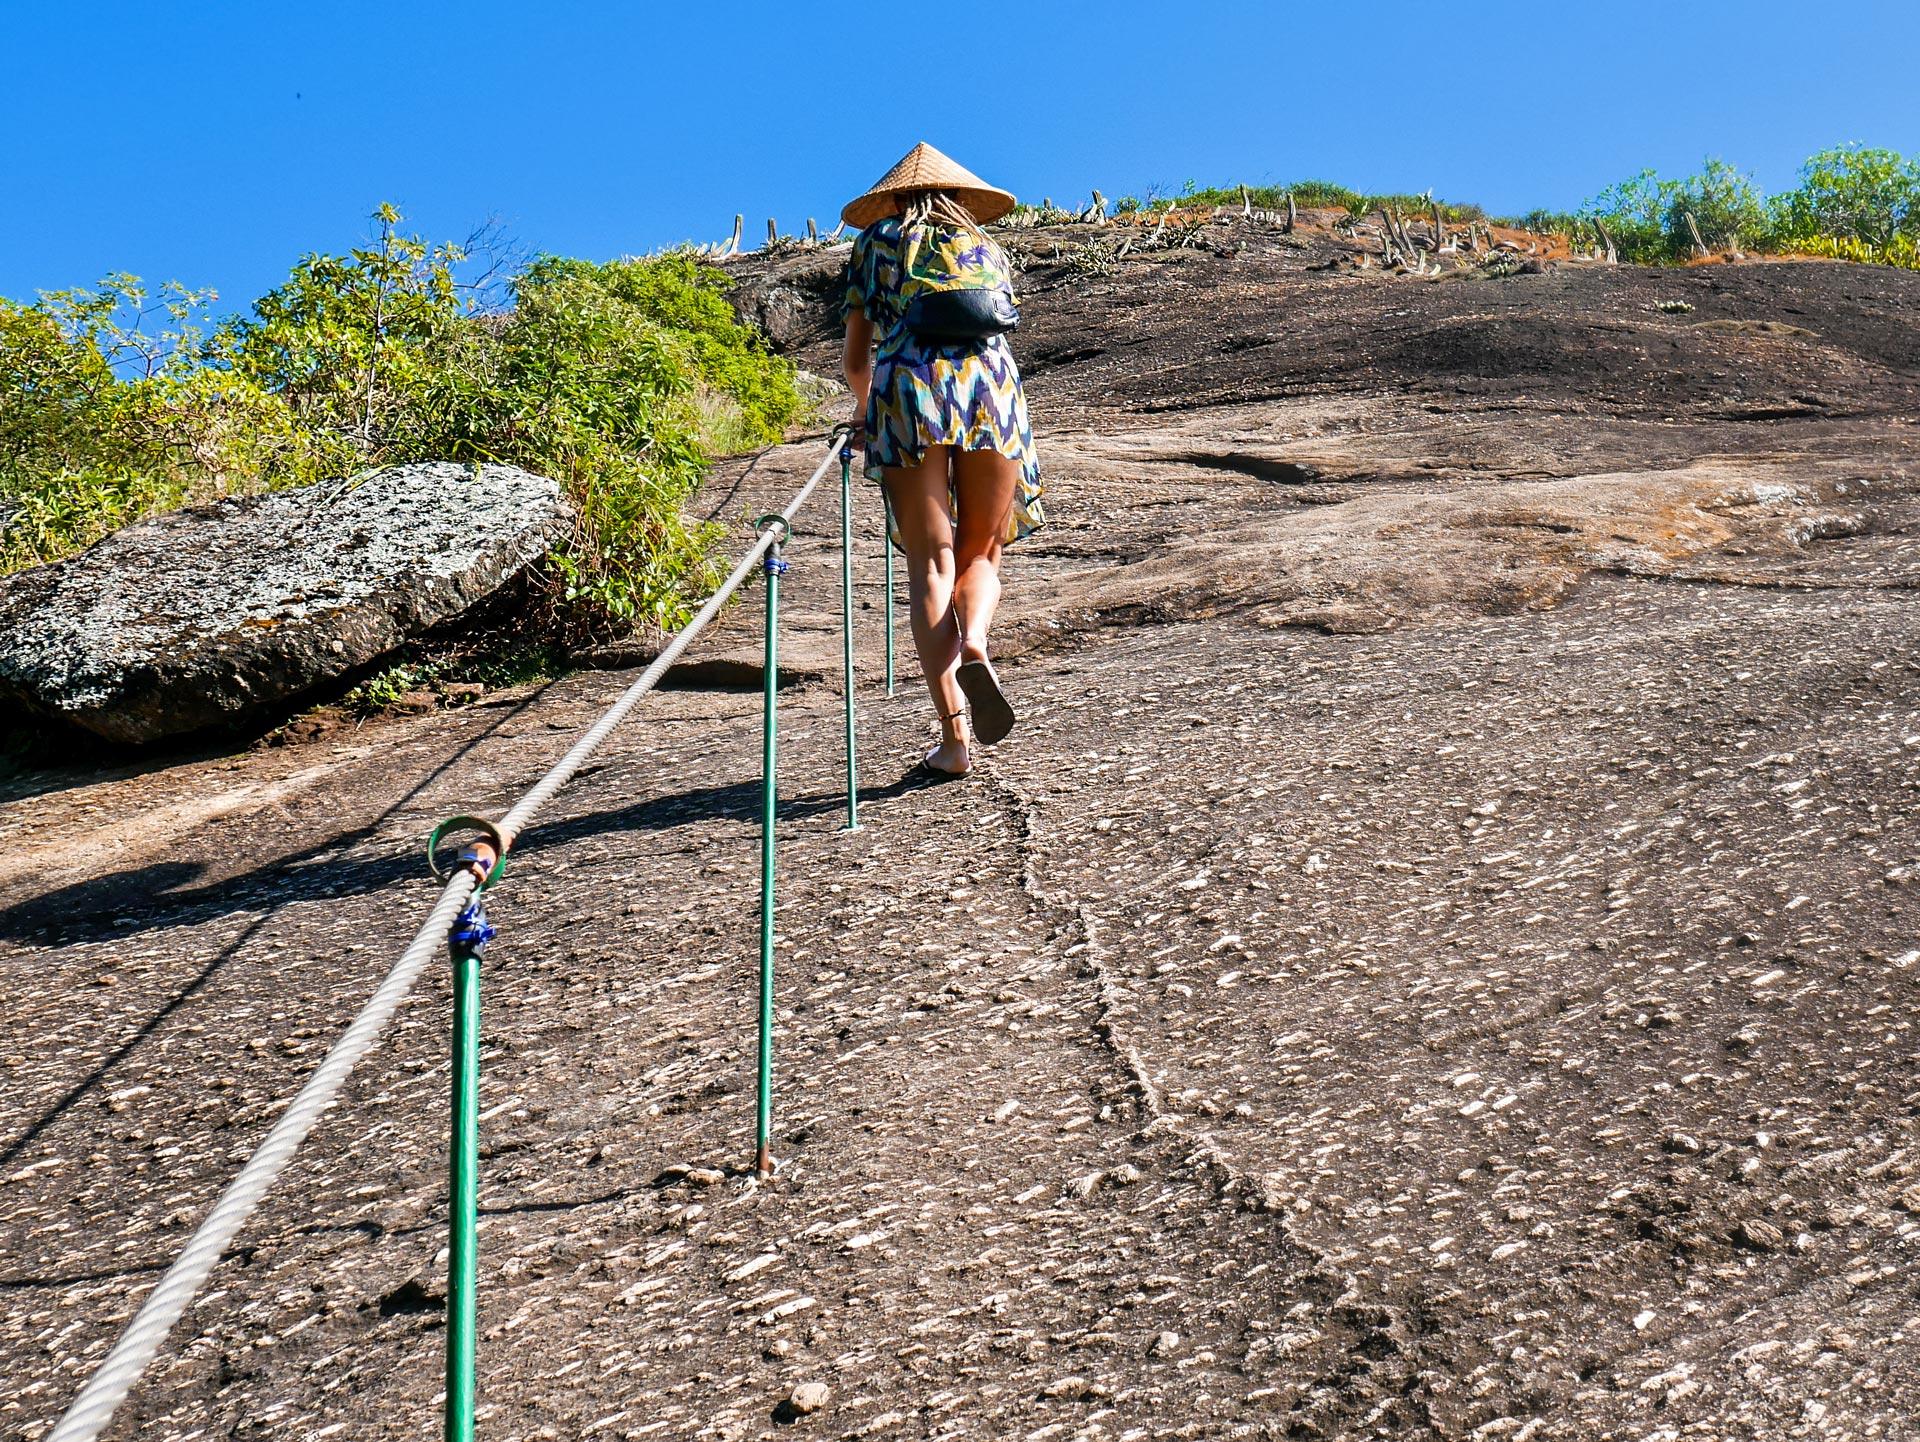 Rasta girl climbing up mountain in Itacoatiara, Brazil